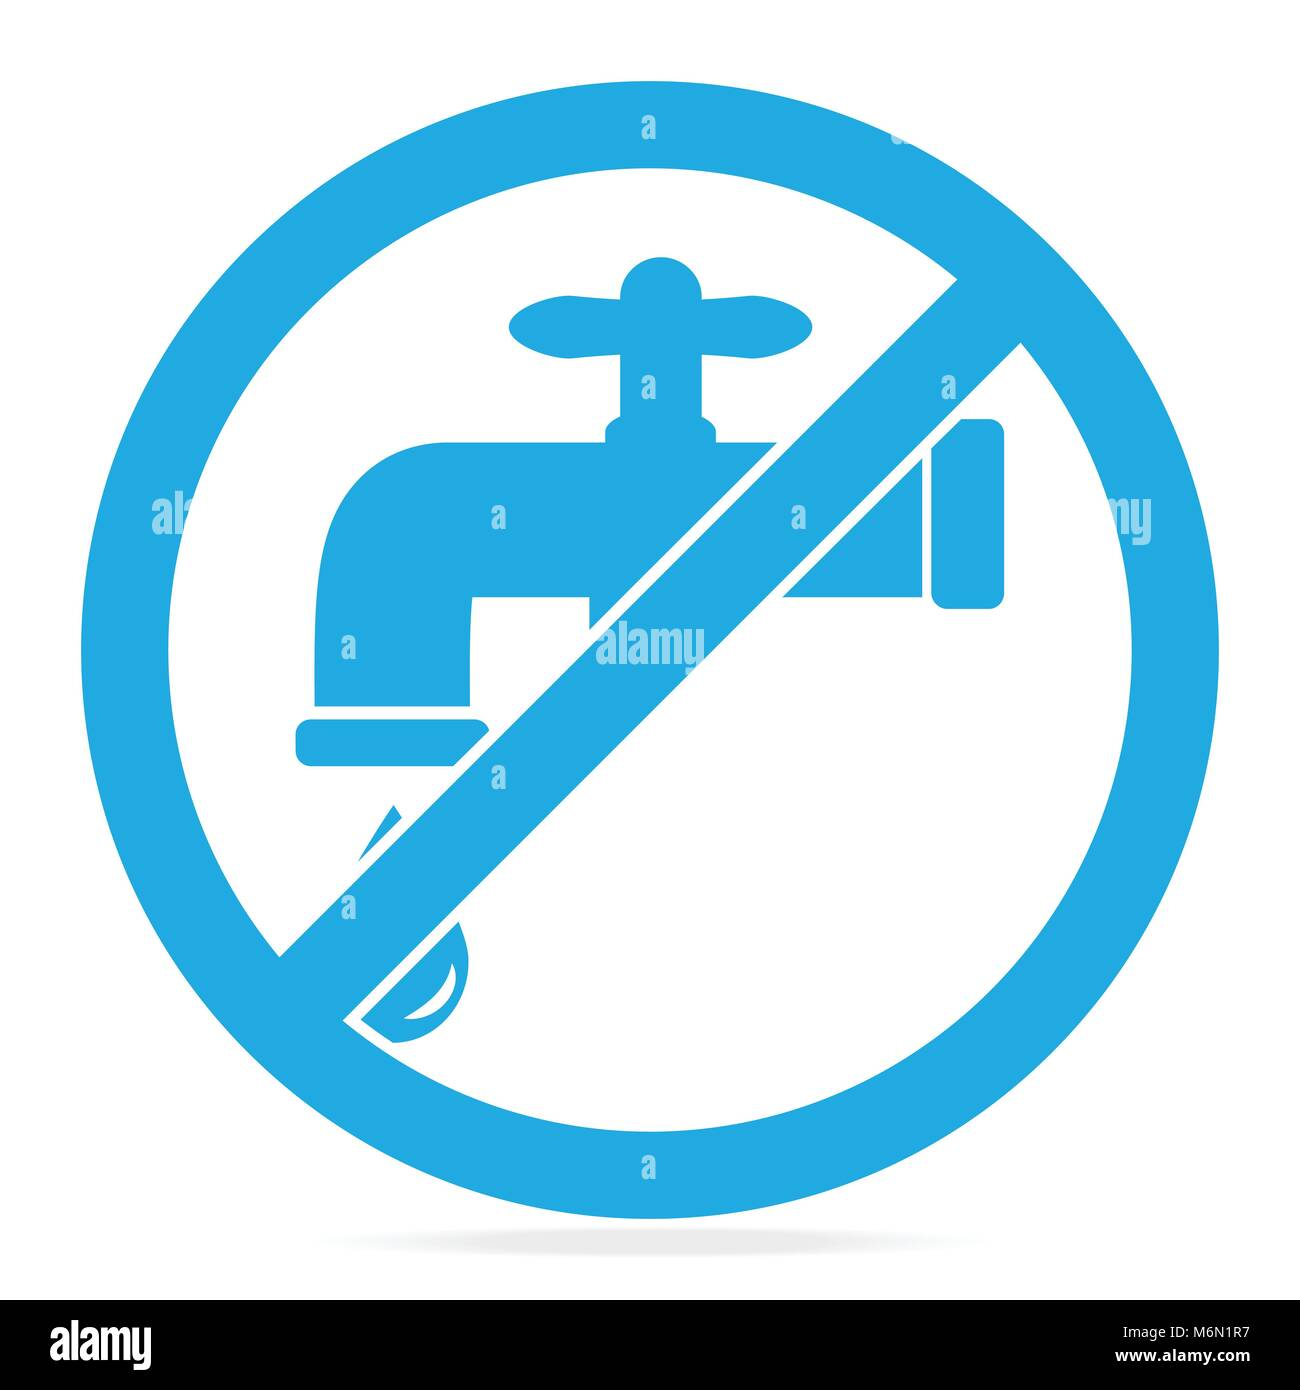 Water System Toilet Stockfotos & Water System Toilet Bilder - Alamy